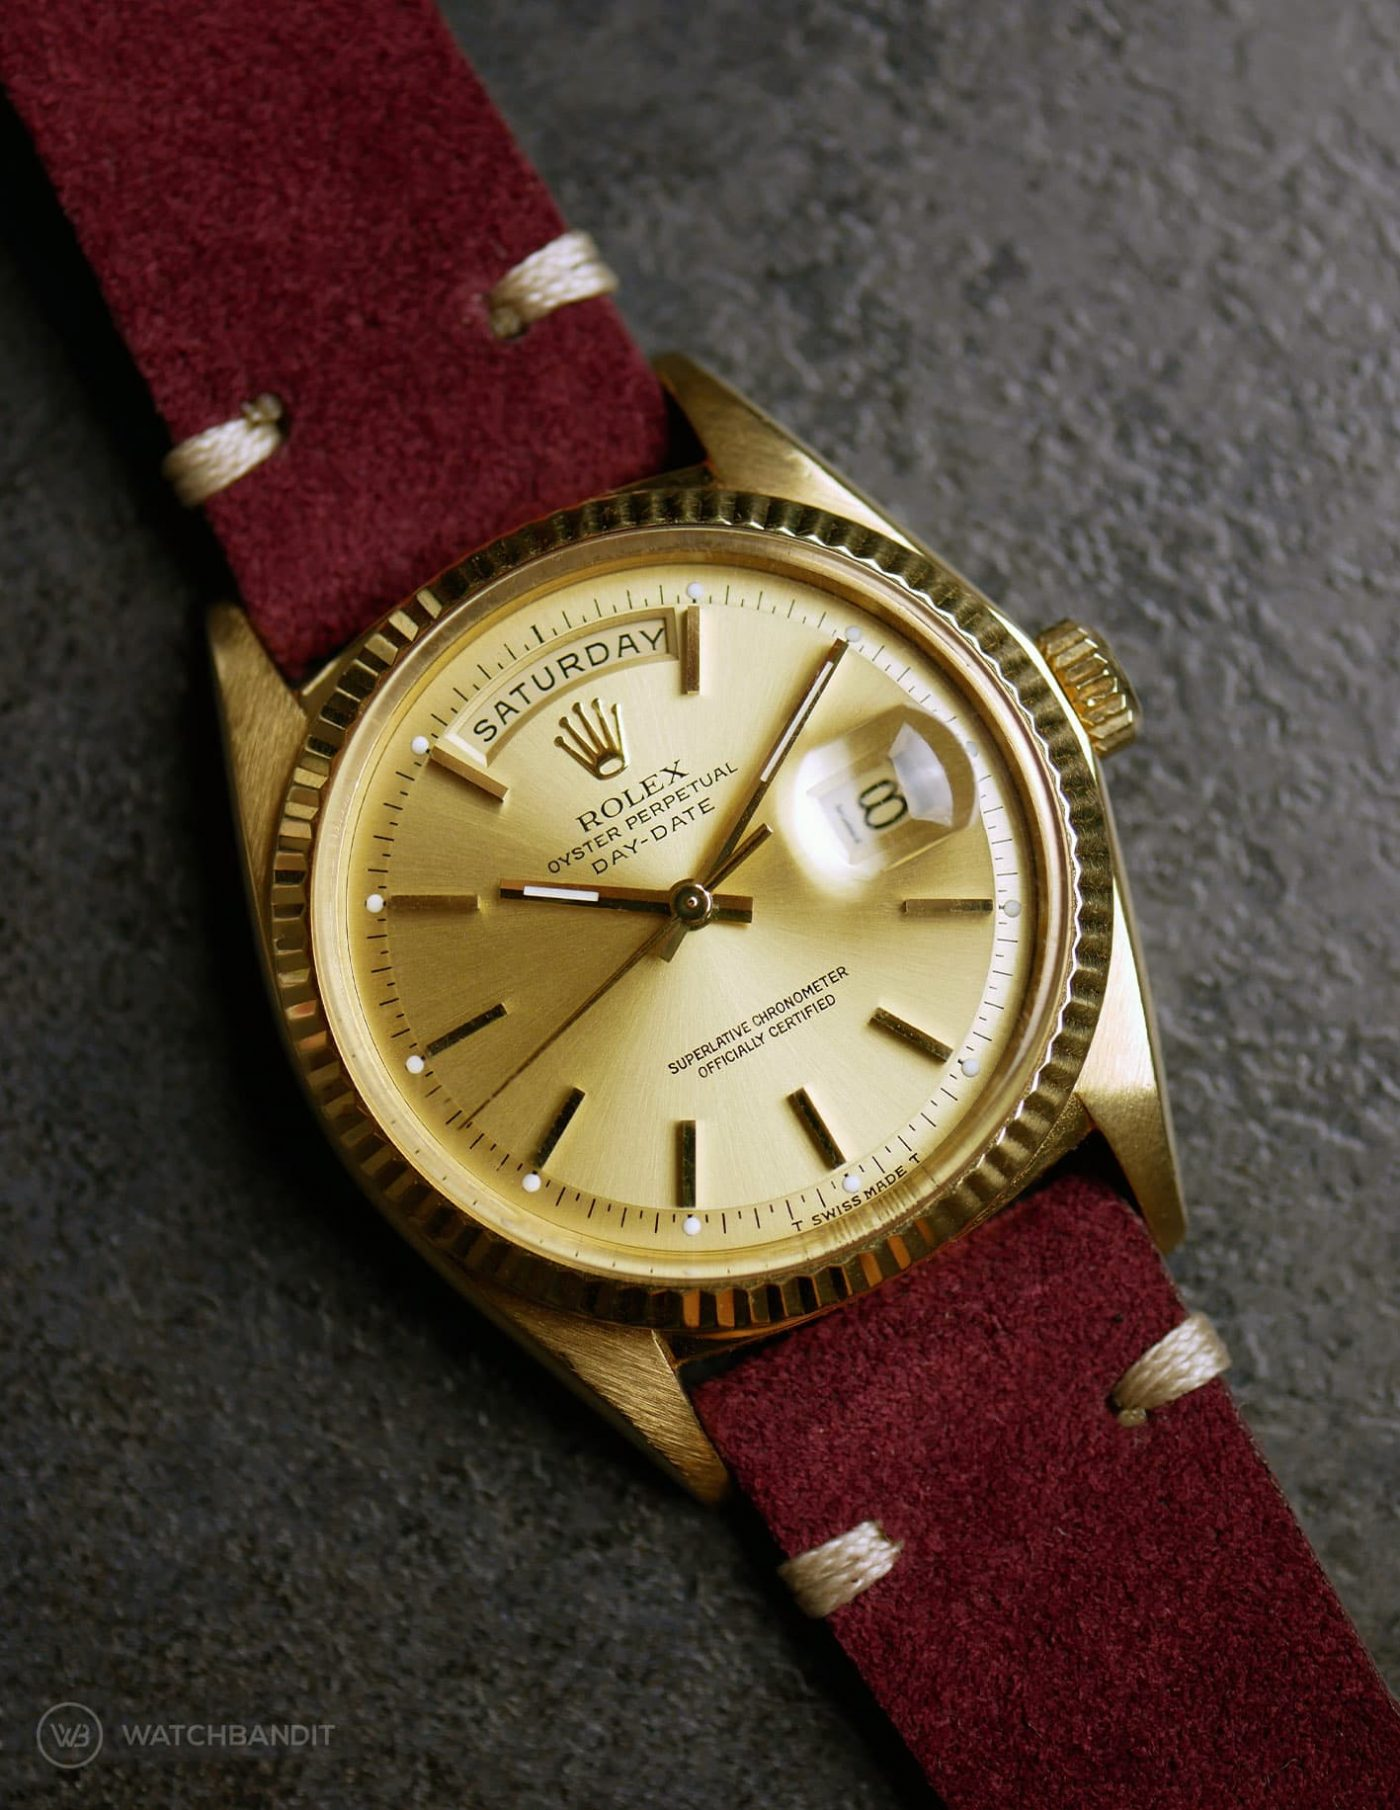 Rolex Day-Date on Watchbandit burgundy vintage suede leather strap